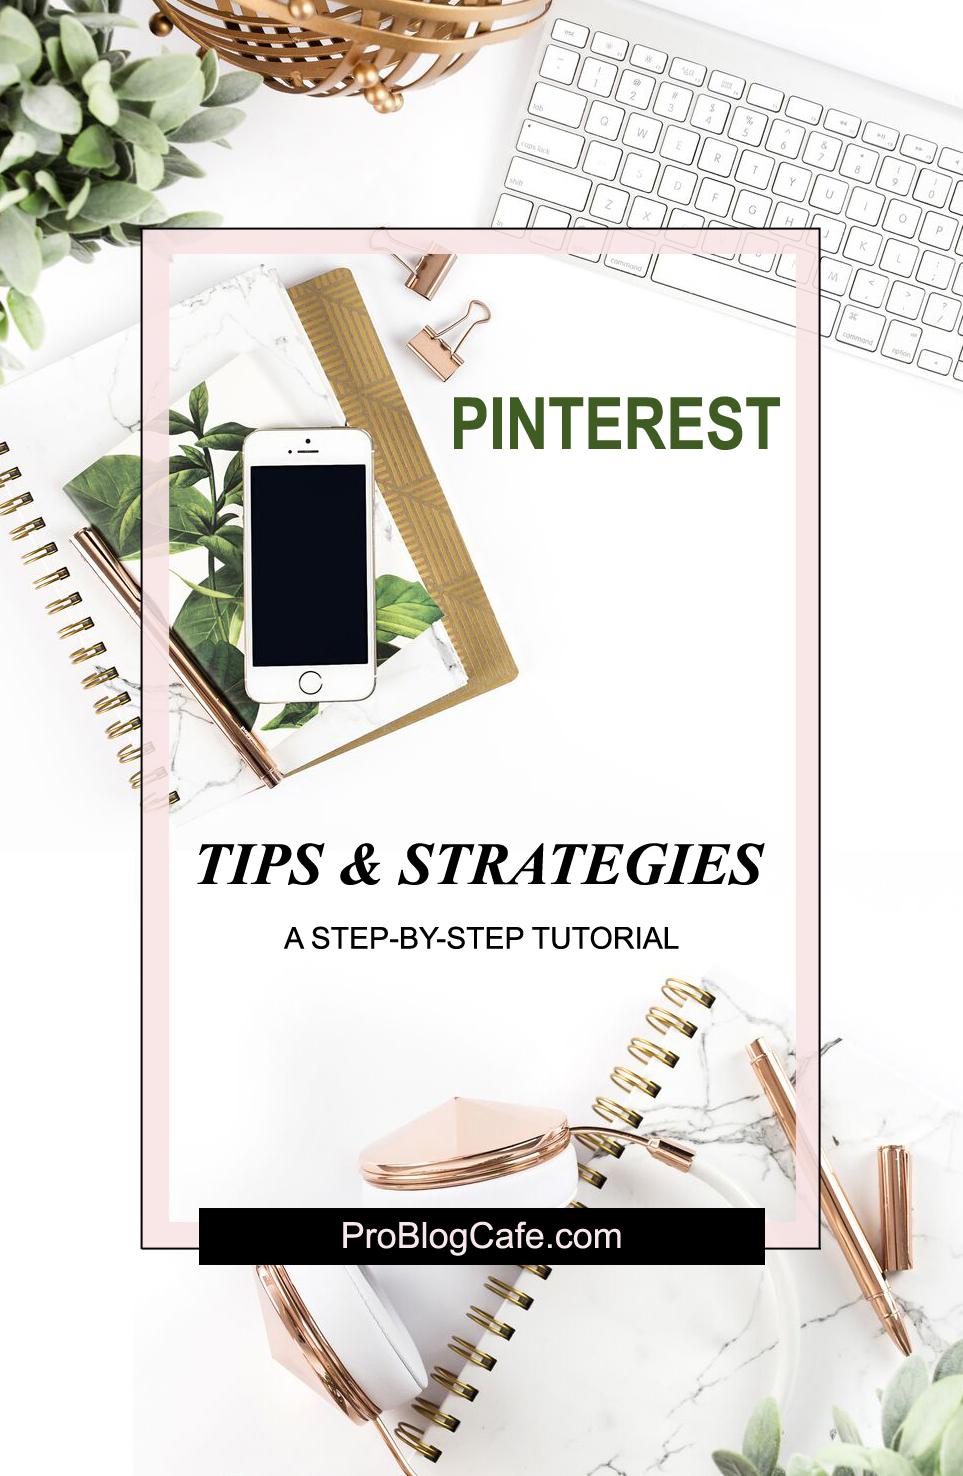 Achieve Success with Pinterest